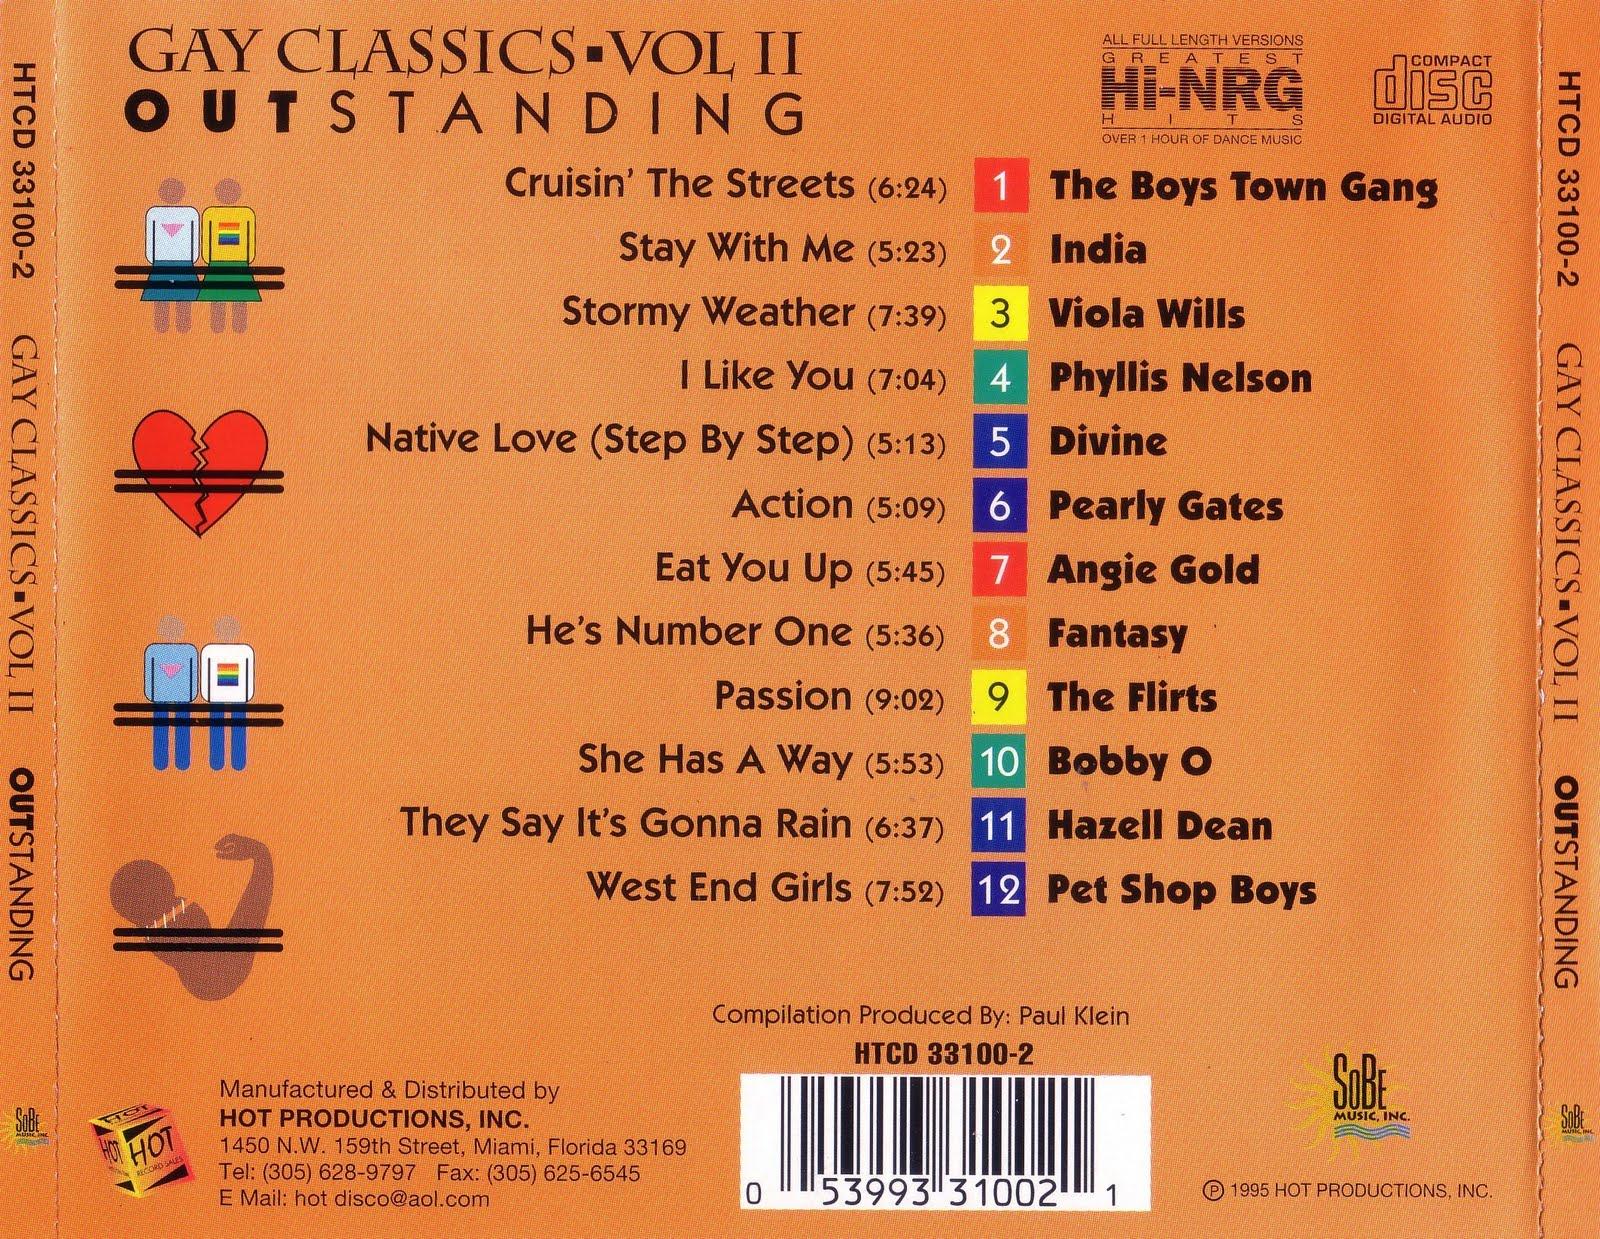 Gay Classics Mega Mix - Volume 1 - mp3 buy, full